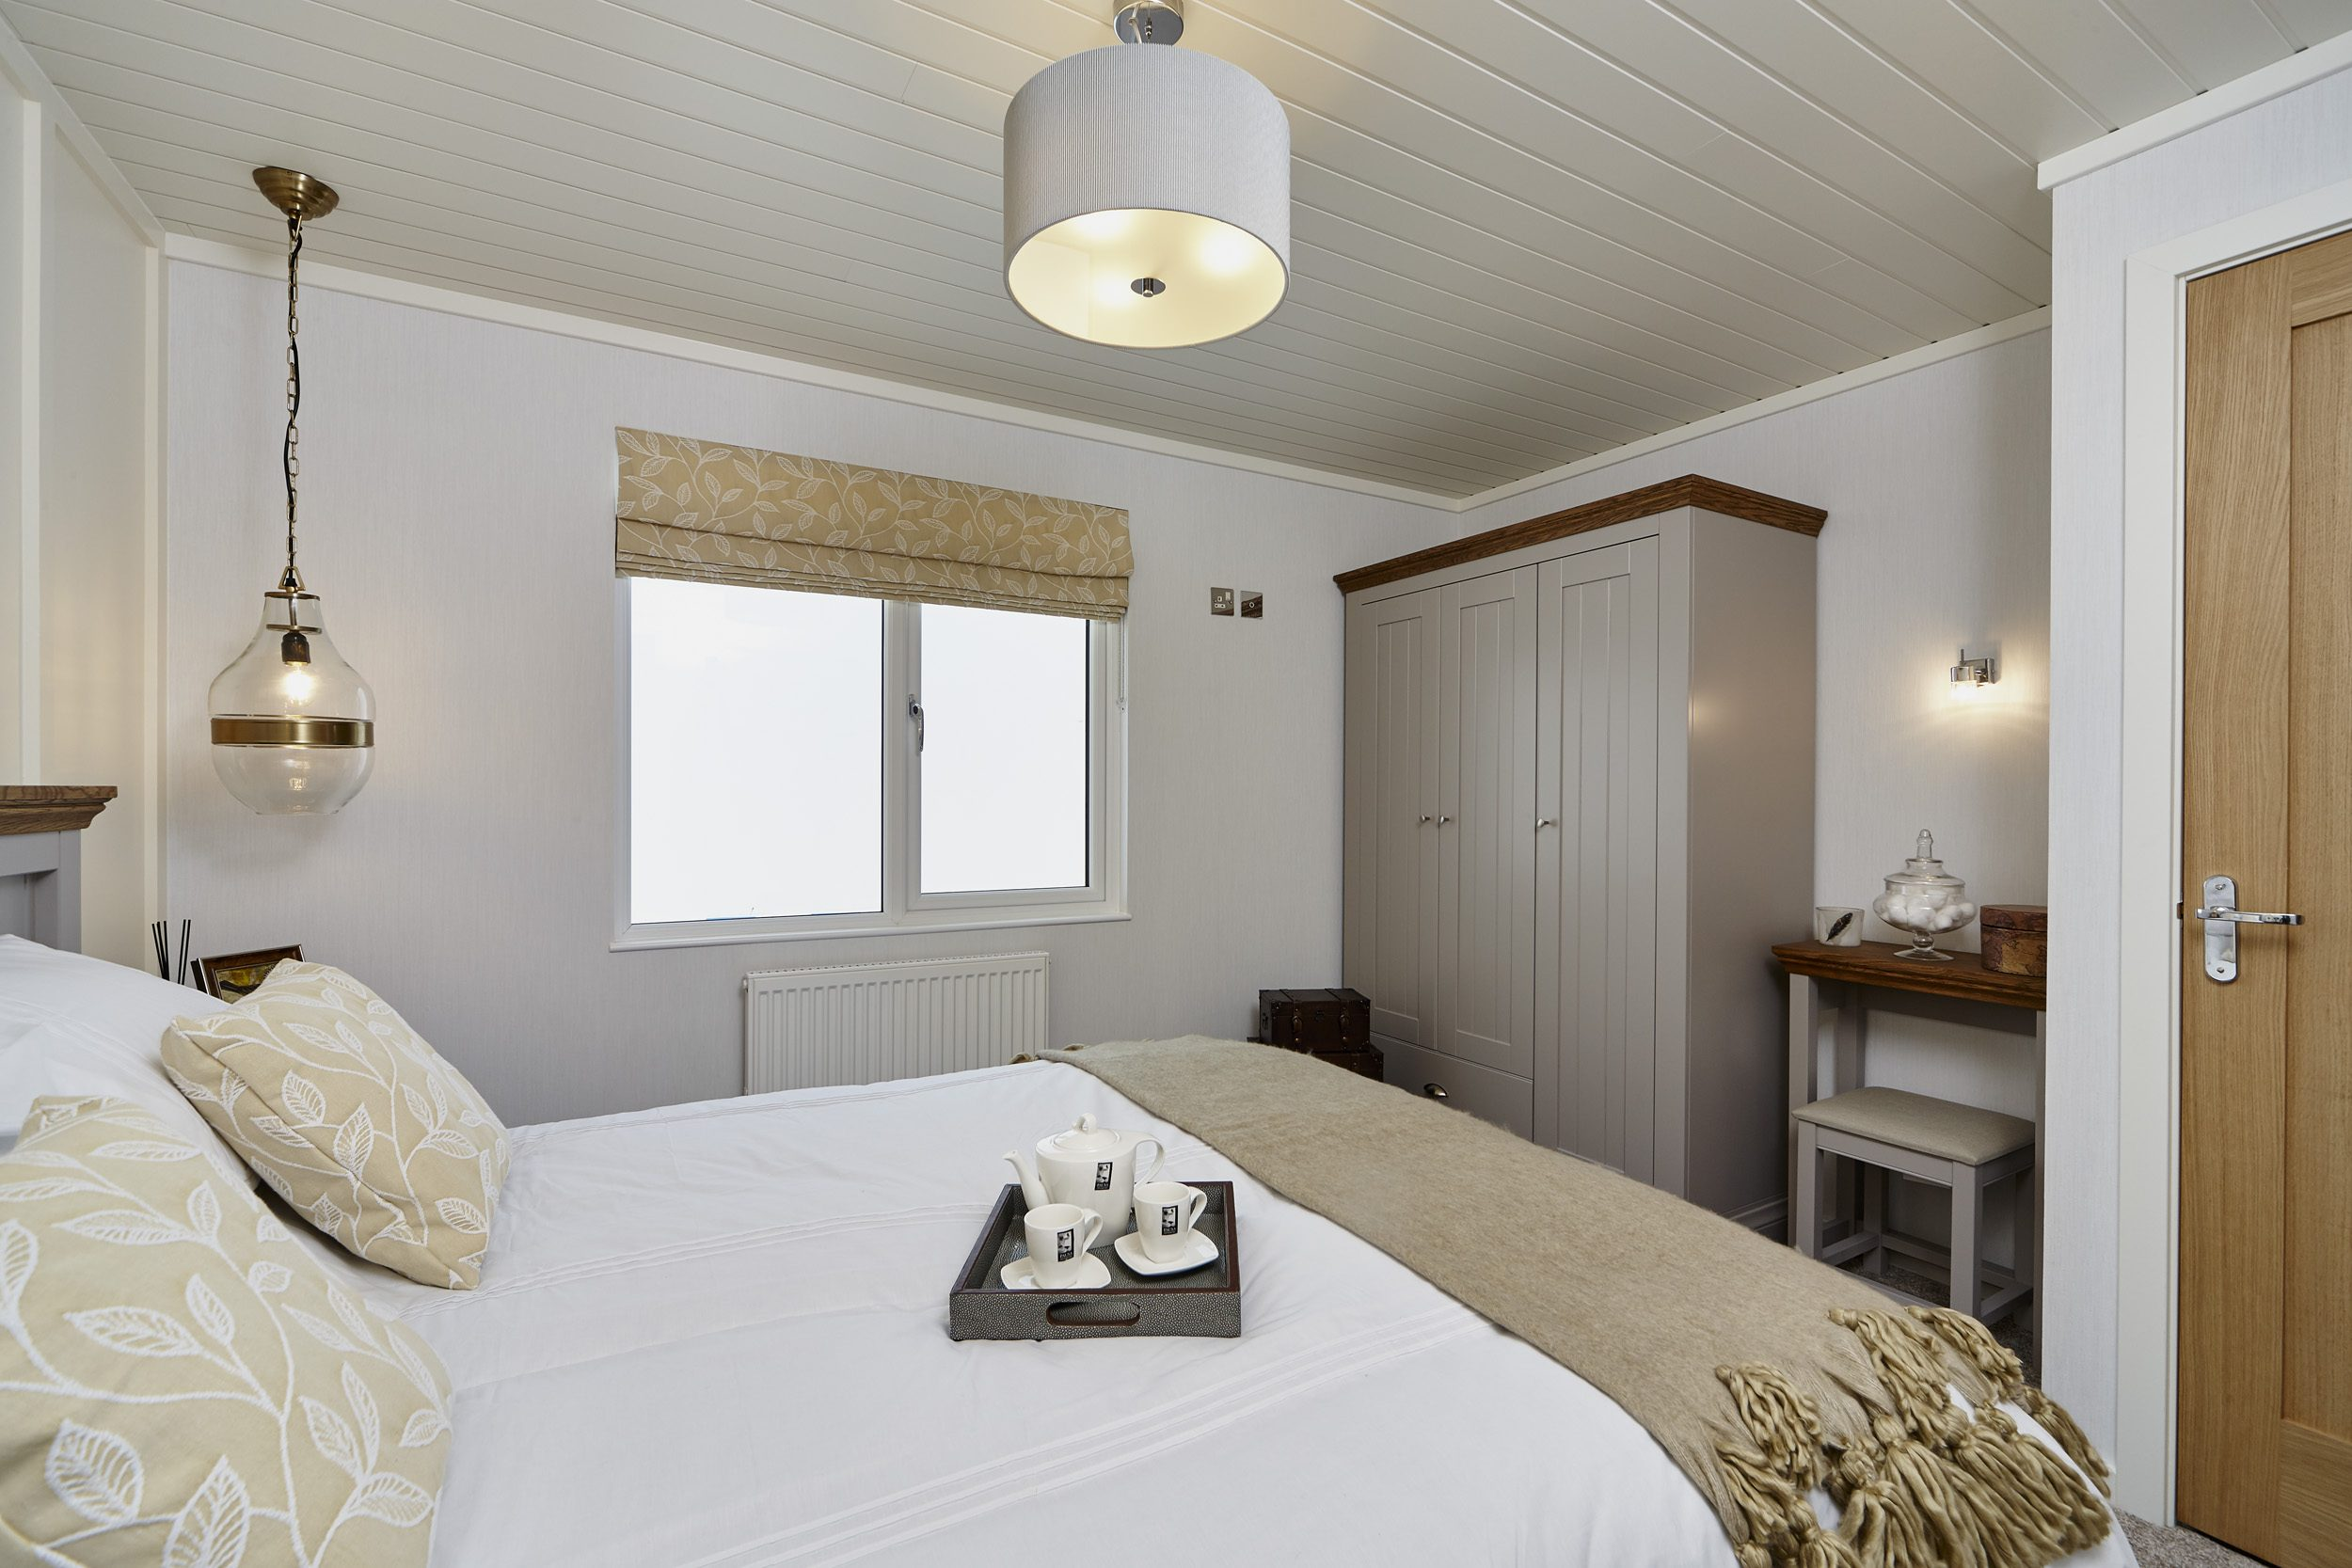 The Muskoka lodge, bedroom view - double room